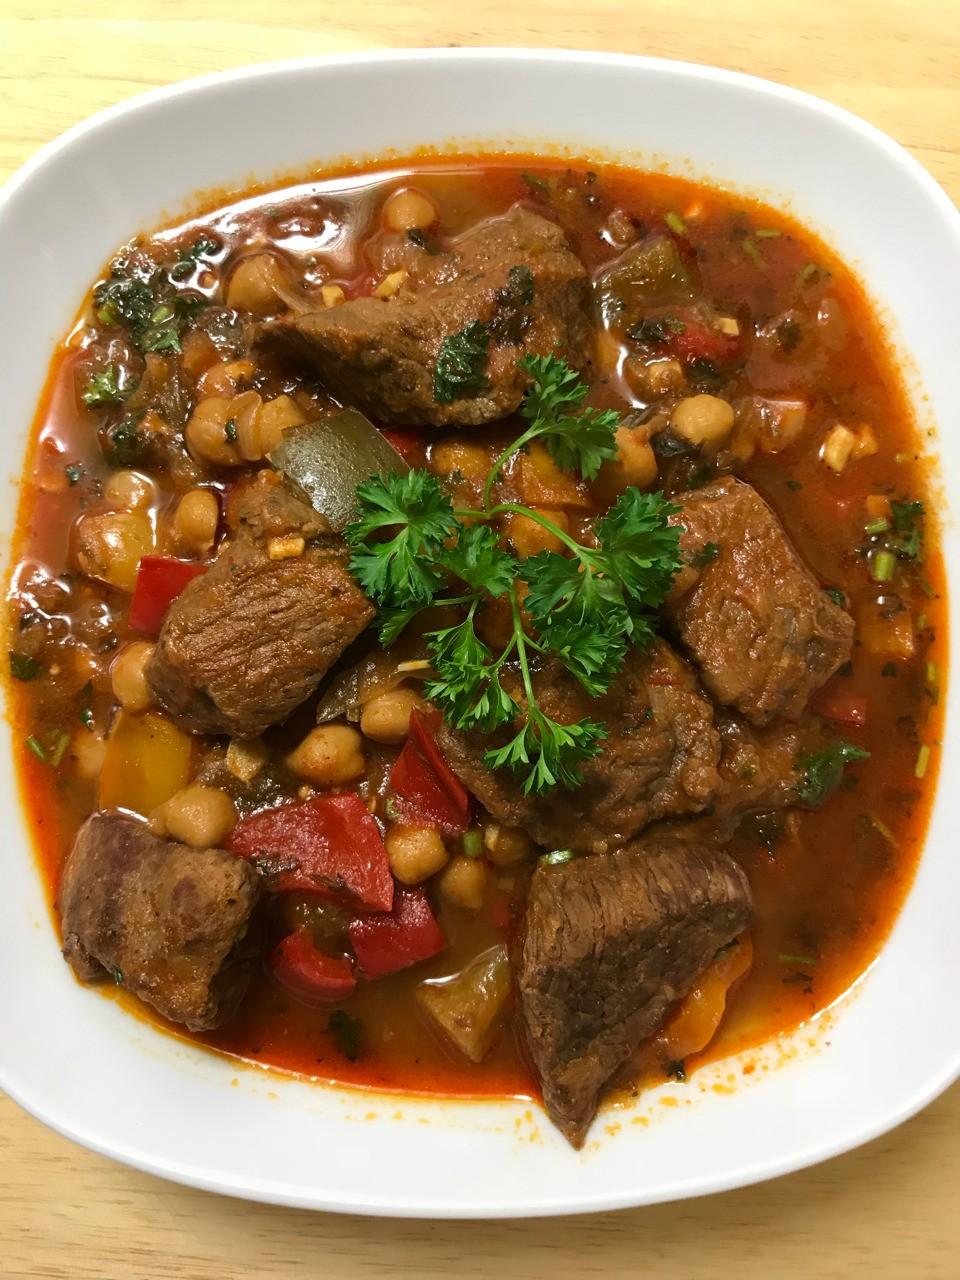 Mermez - Tunisian Beef Stew with Chickpeas